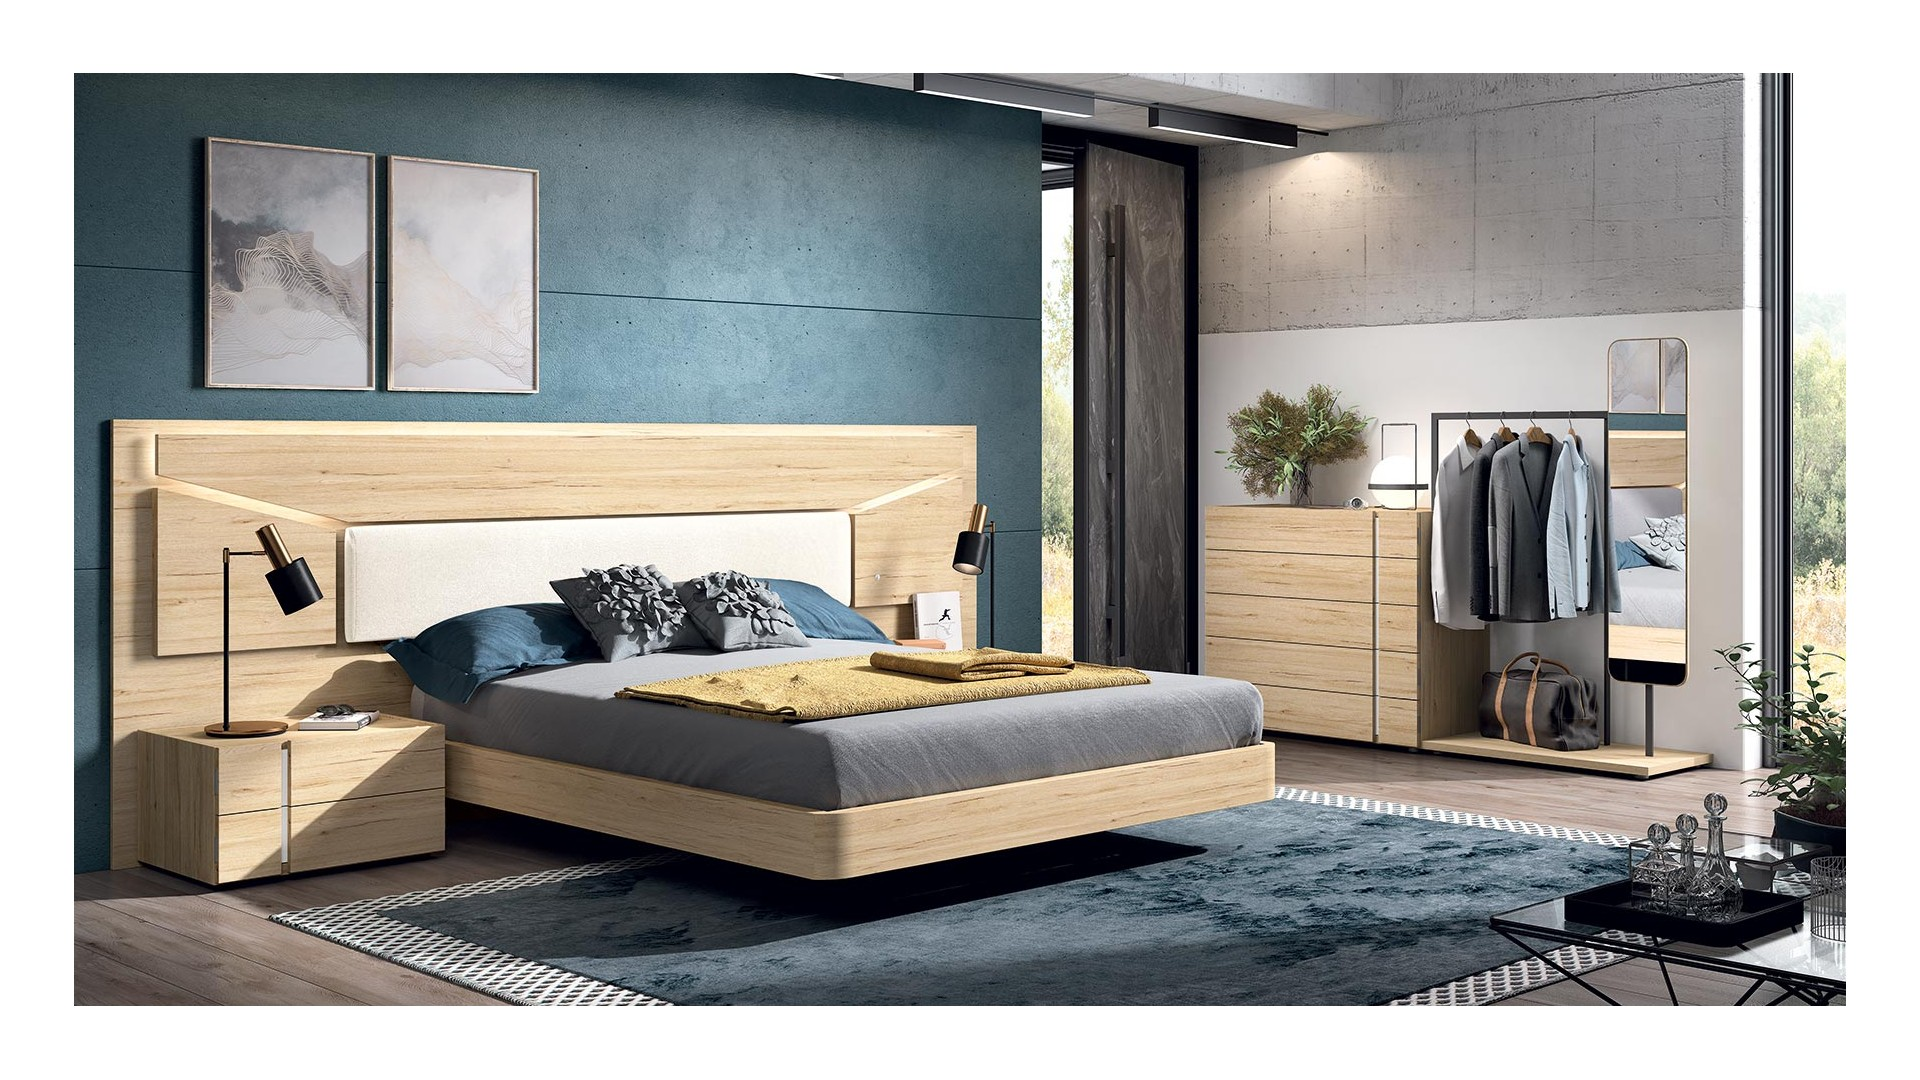 Chambre à coucher adulte complète PERSONNALISABLE COSMO 06 - GLICERIO